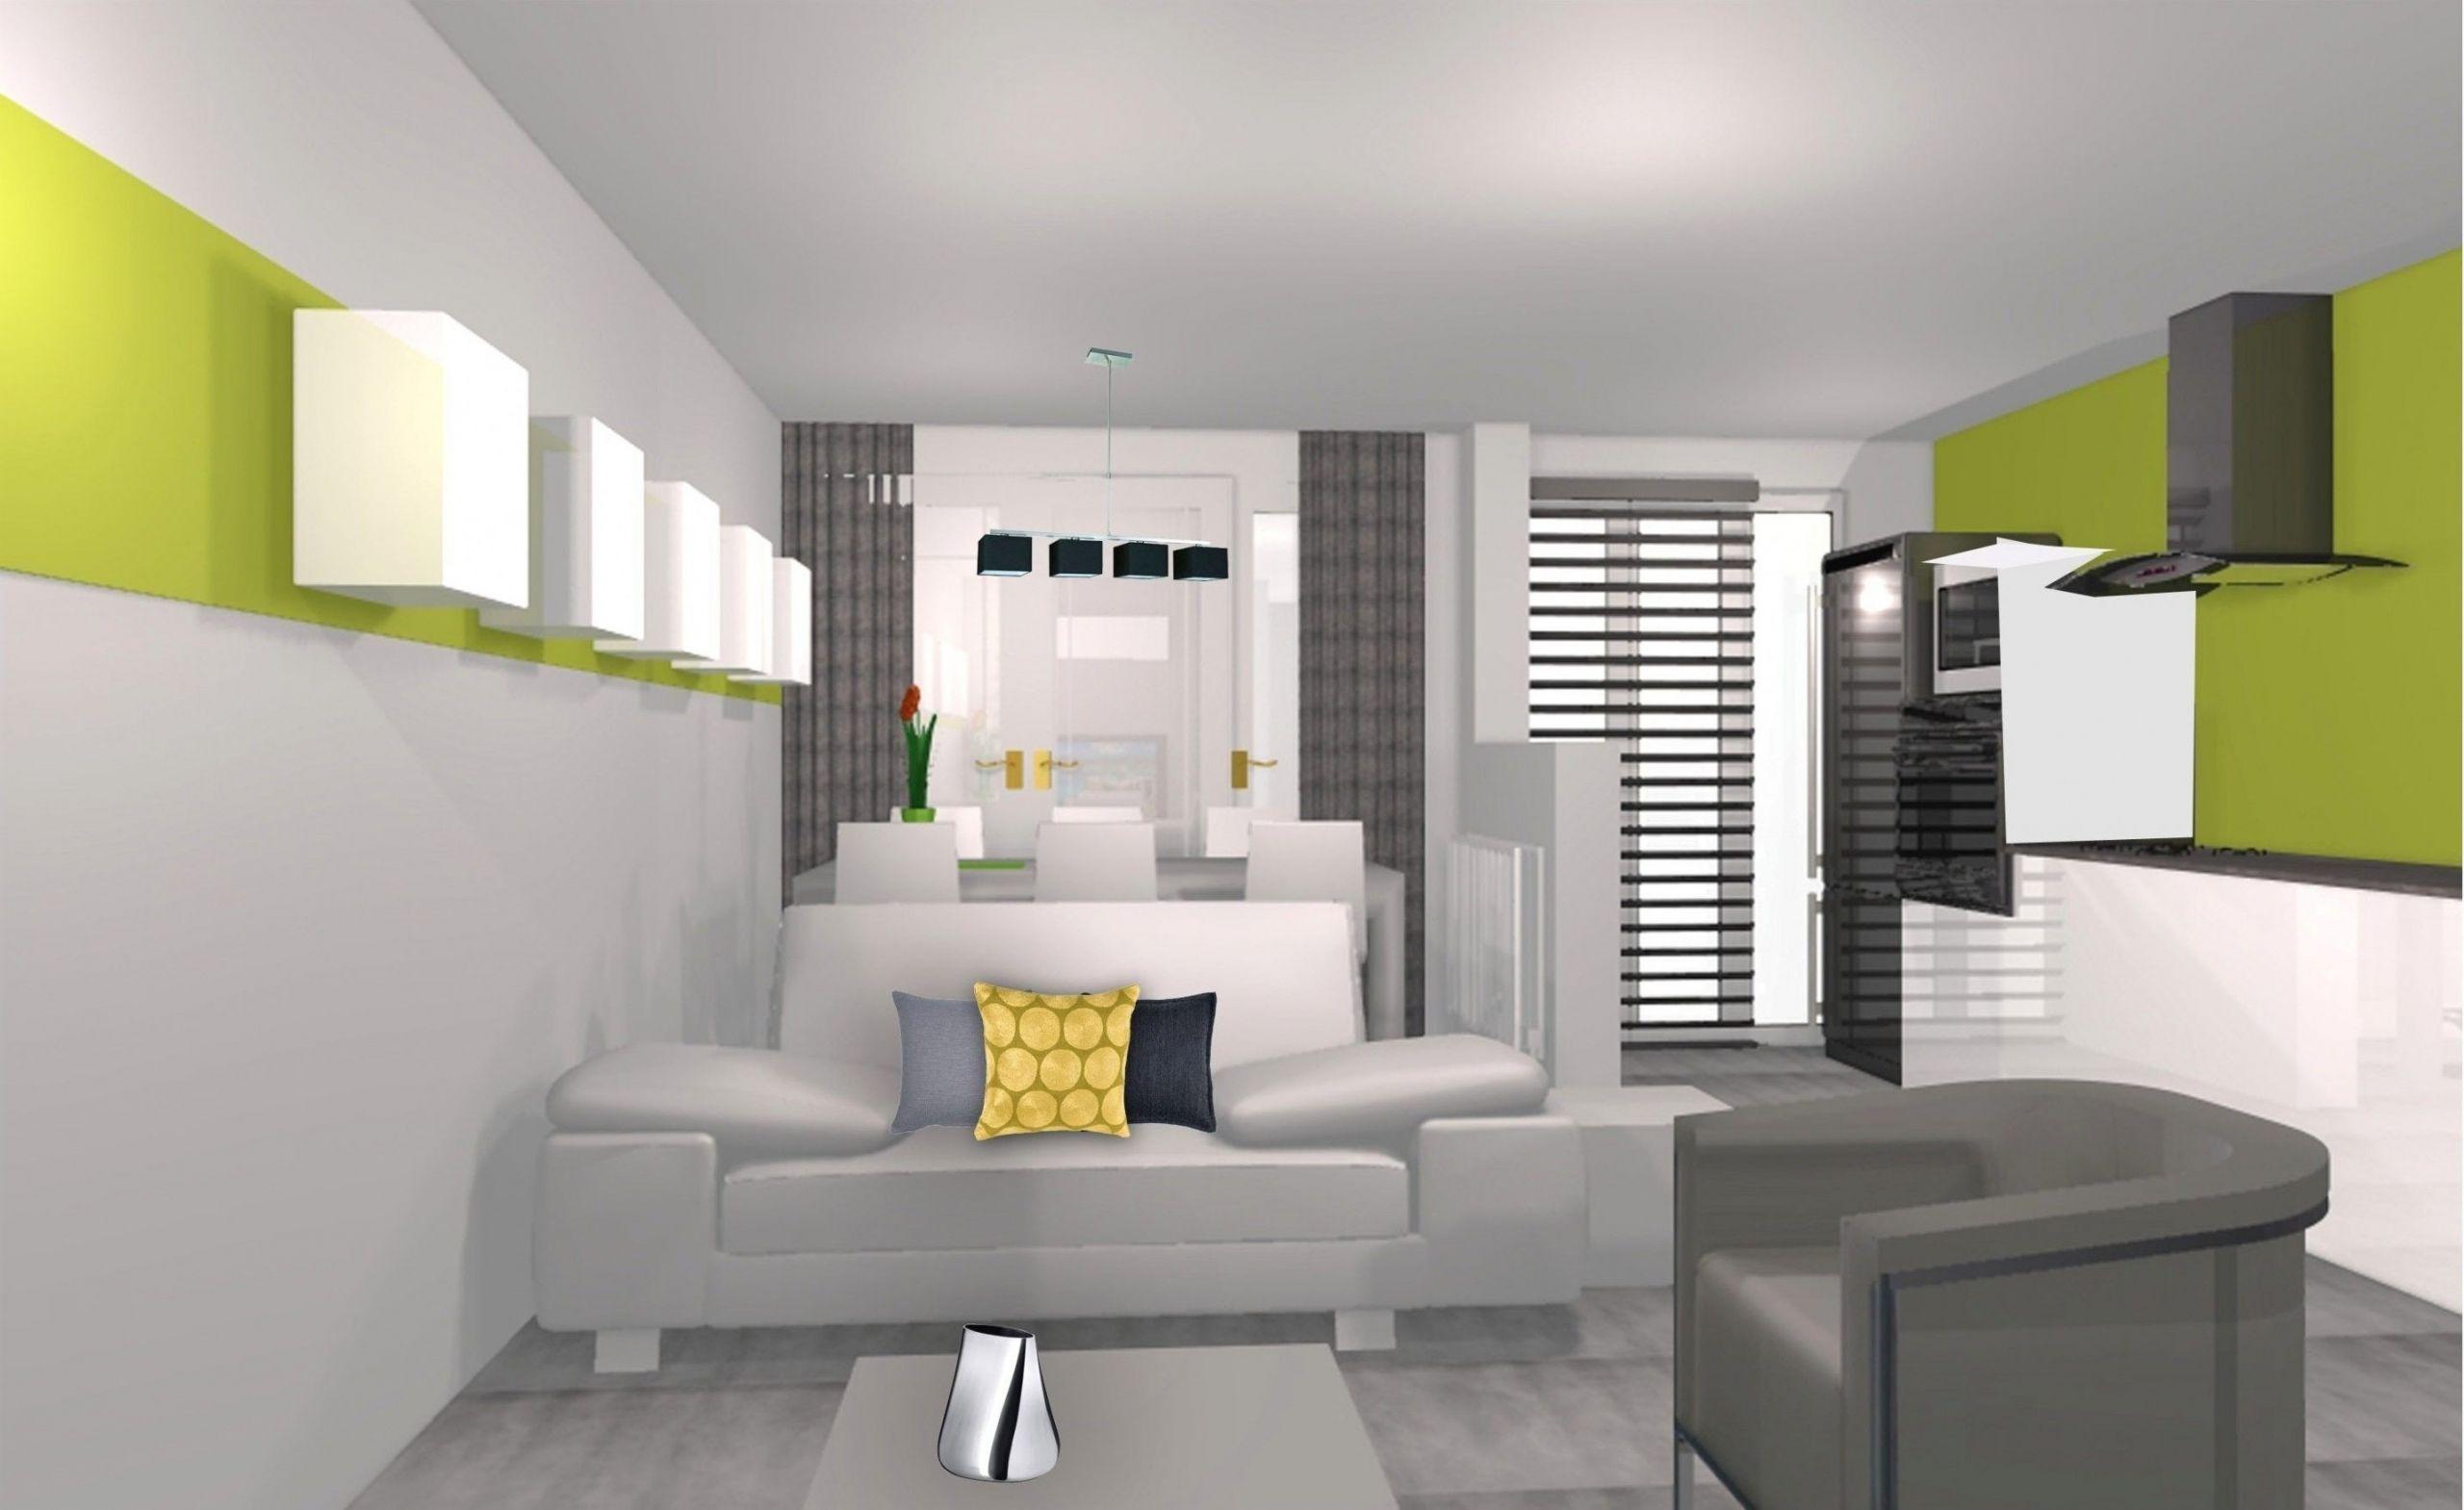 meuble salon tv meuble de salon but meubles tv genial meuble salon but elegant of meuble salon tv